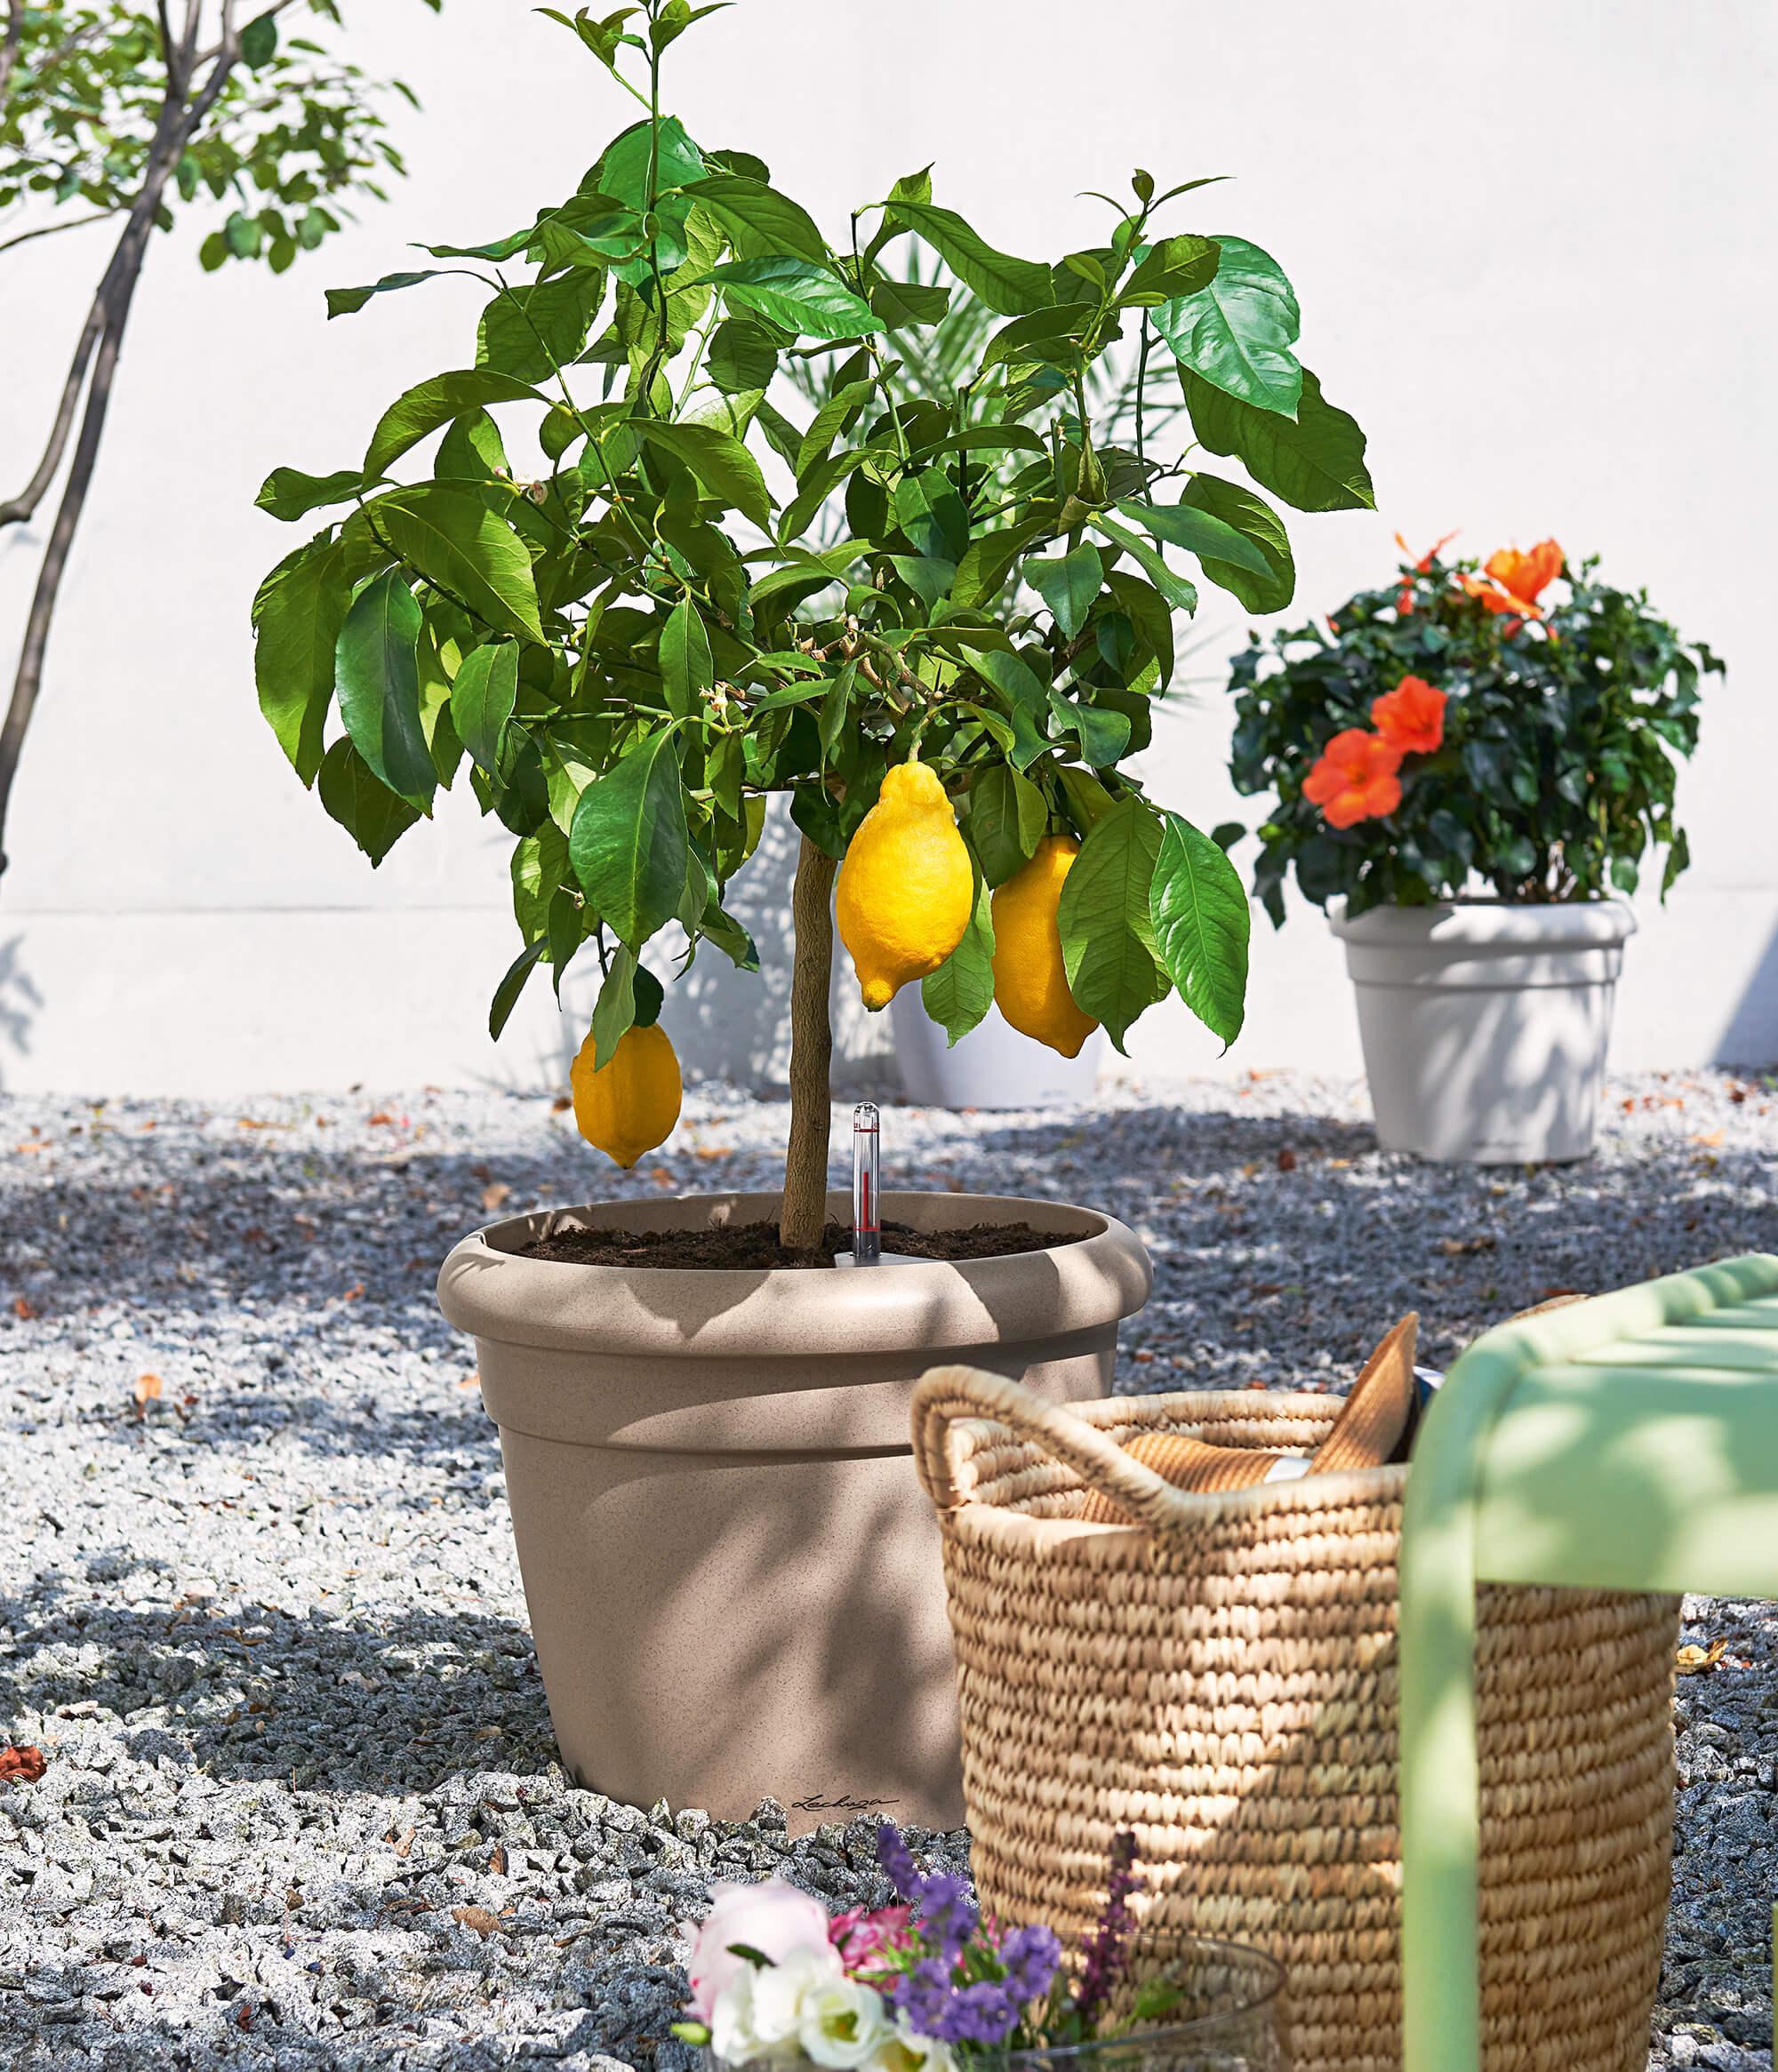 le_tw-urban-gardening_rustico35_sandb